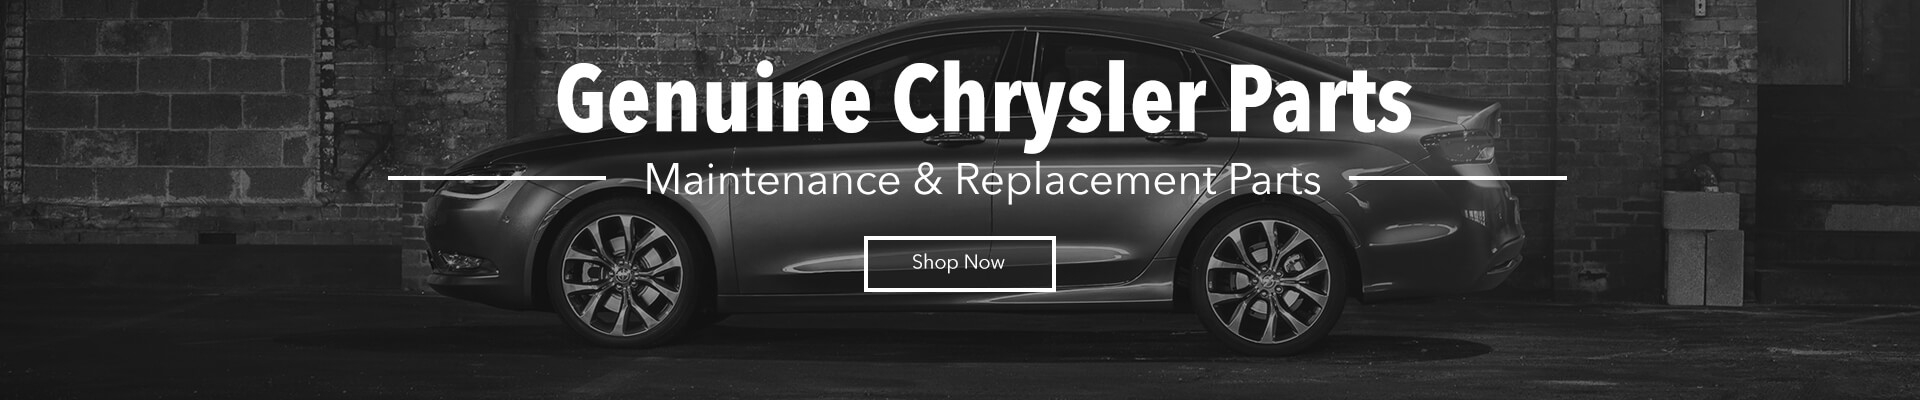 Genuine Chrysler Parts